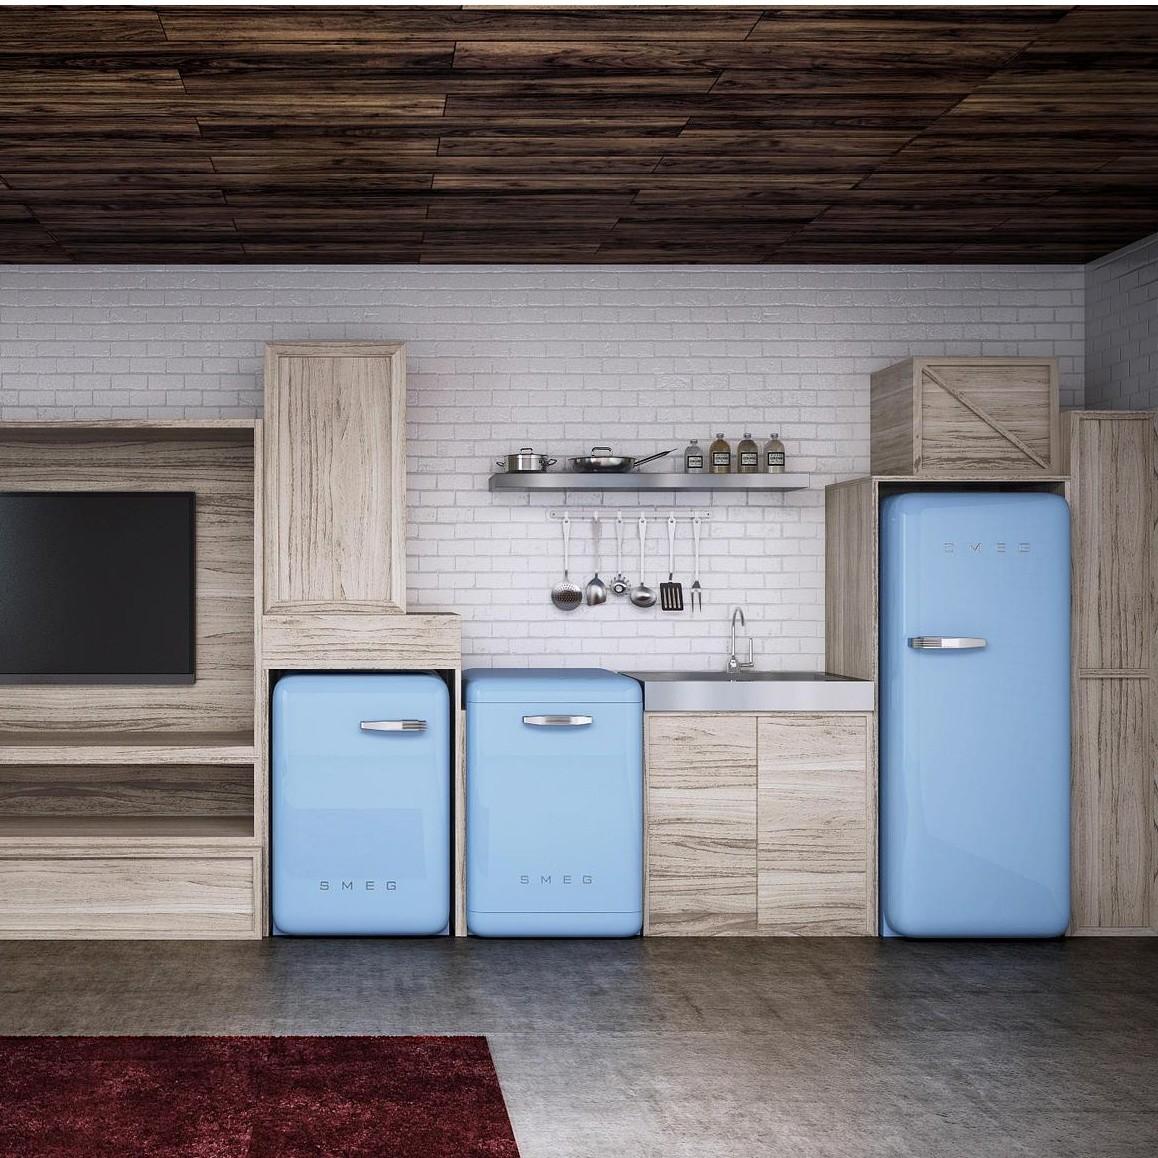 smeg fab28 fridge smeg. Black Bedroom Furniture Sets. Home Design Ideas